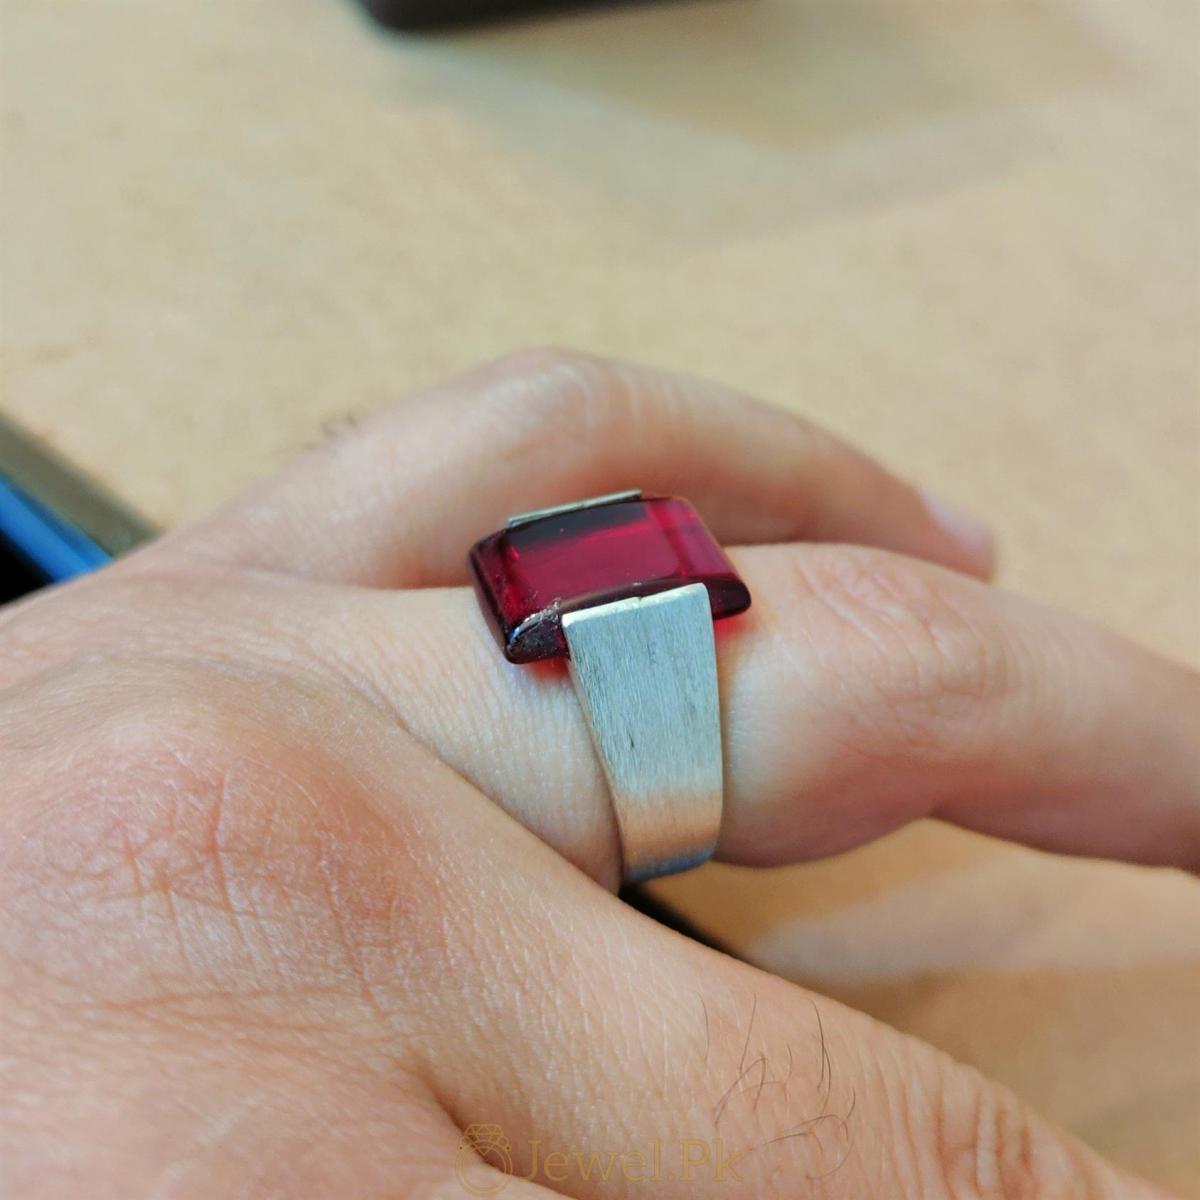 925 Silver handmade rings 4 natural gemstones pakistan + 925 silver jewelry online